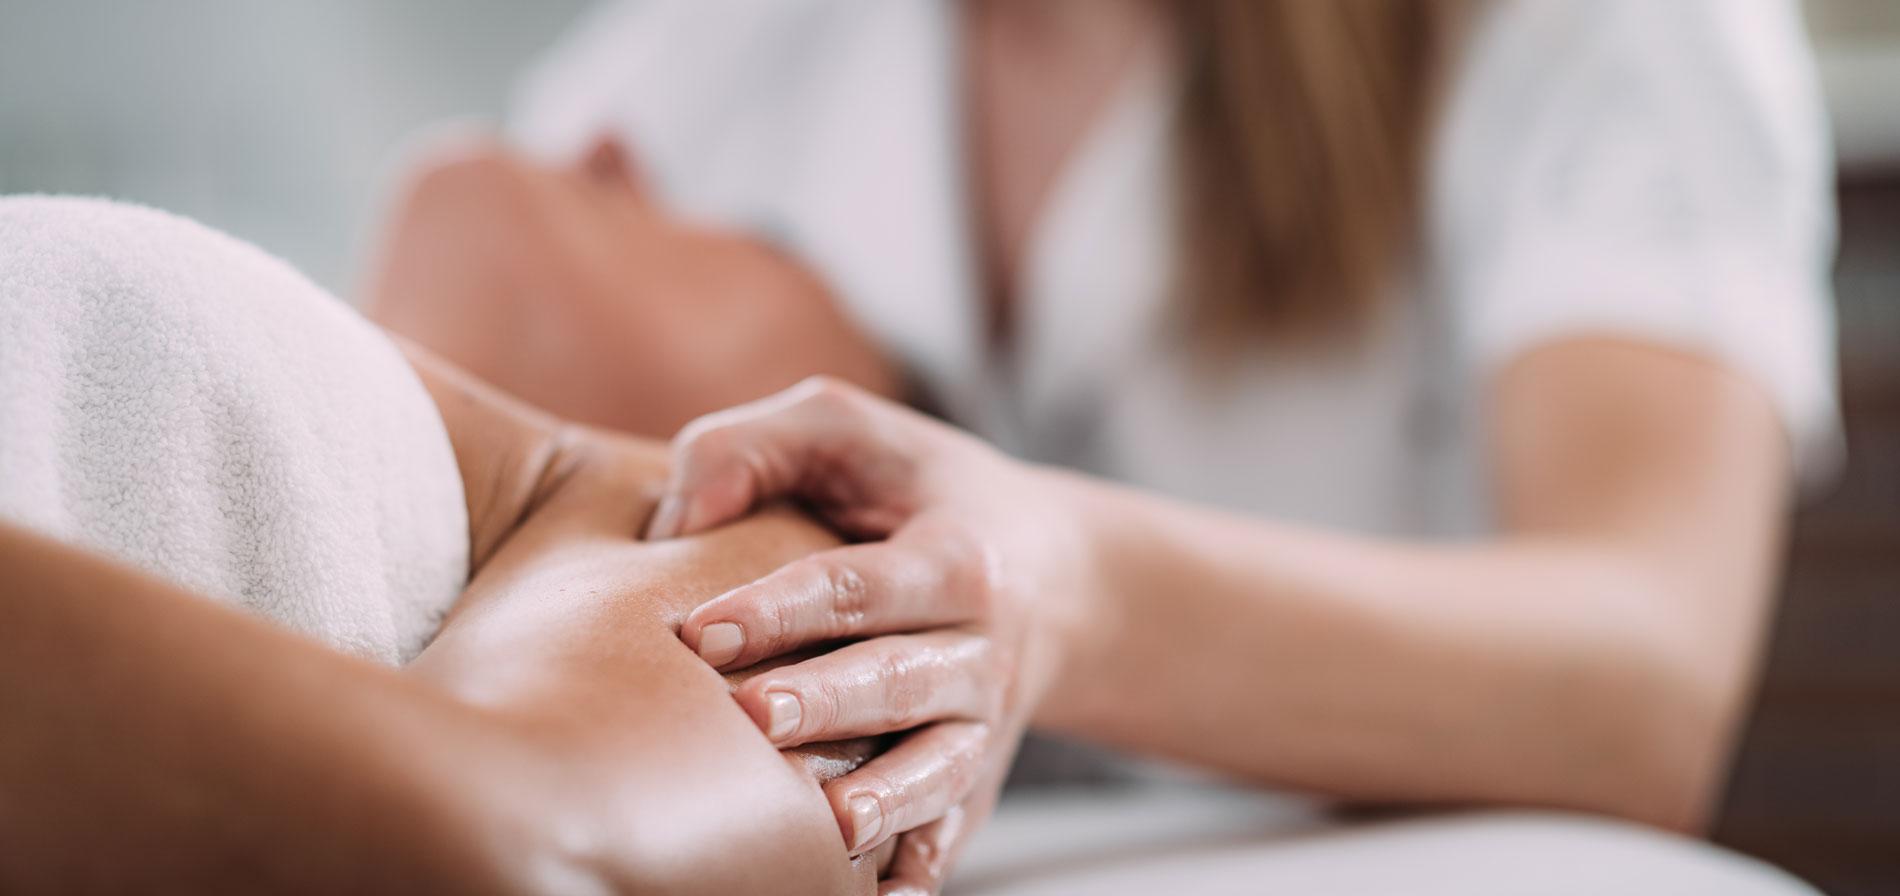 shoulder-sports-massage-therapy-6B92SVZ-web-1900